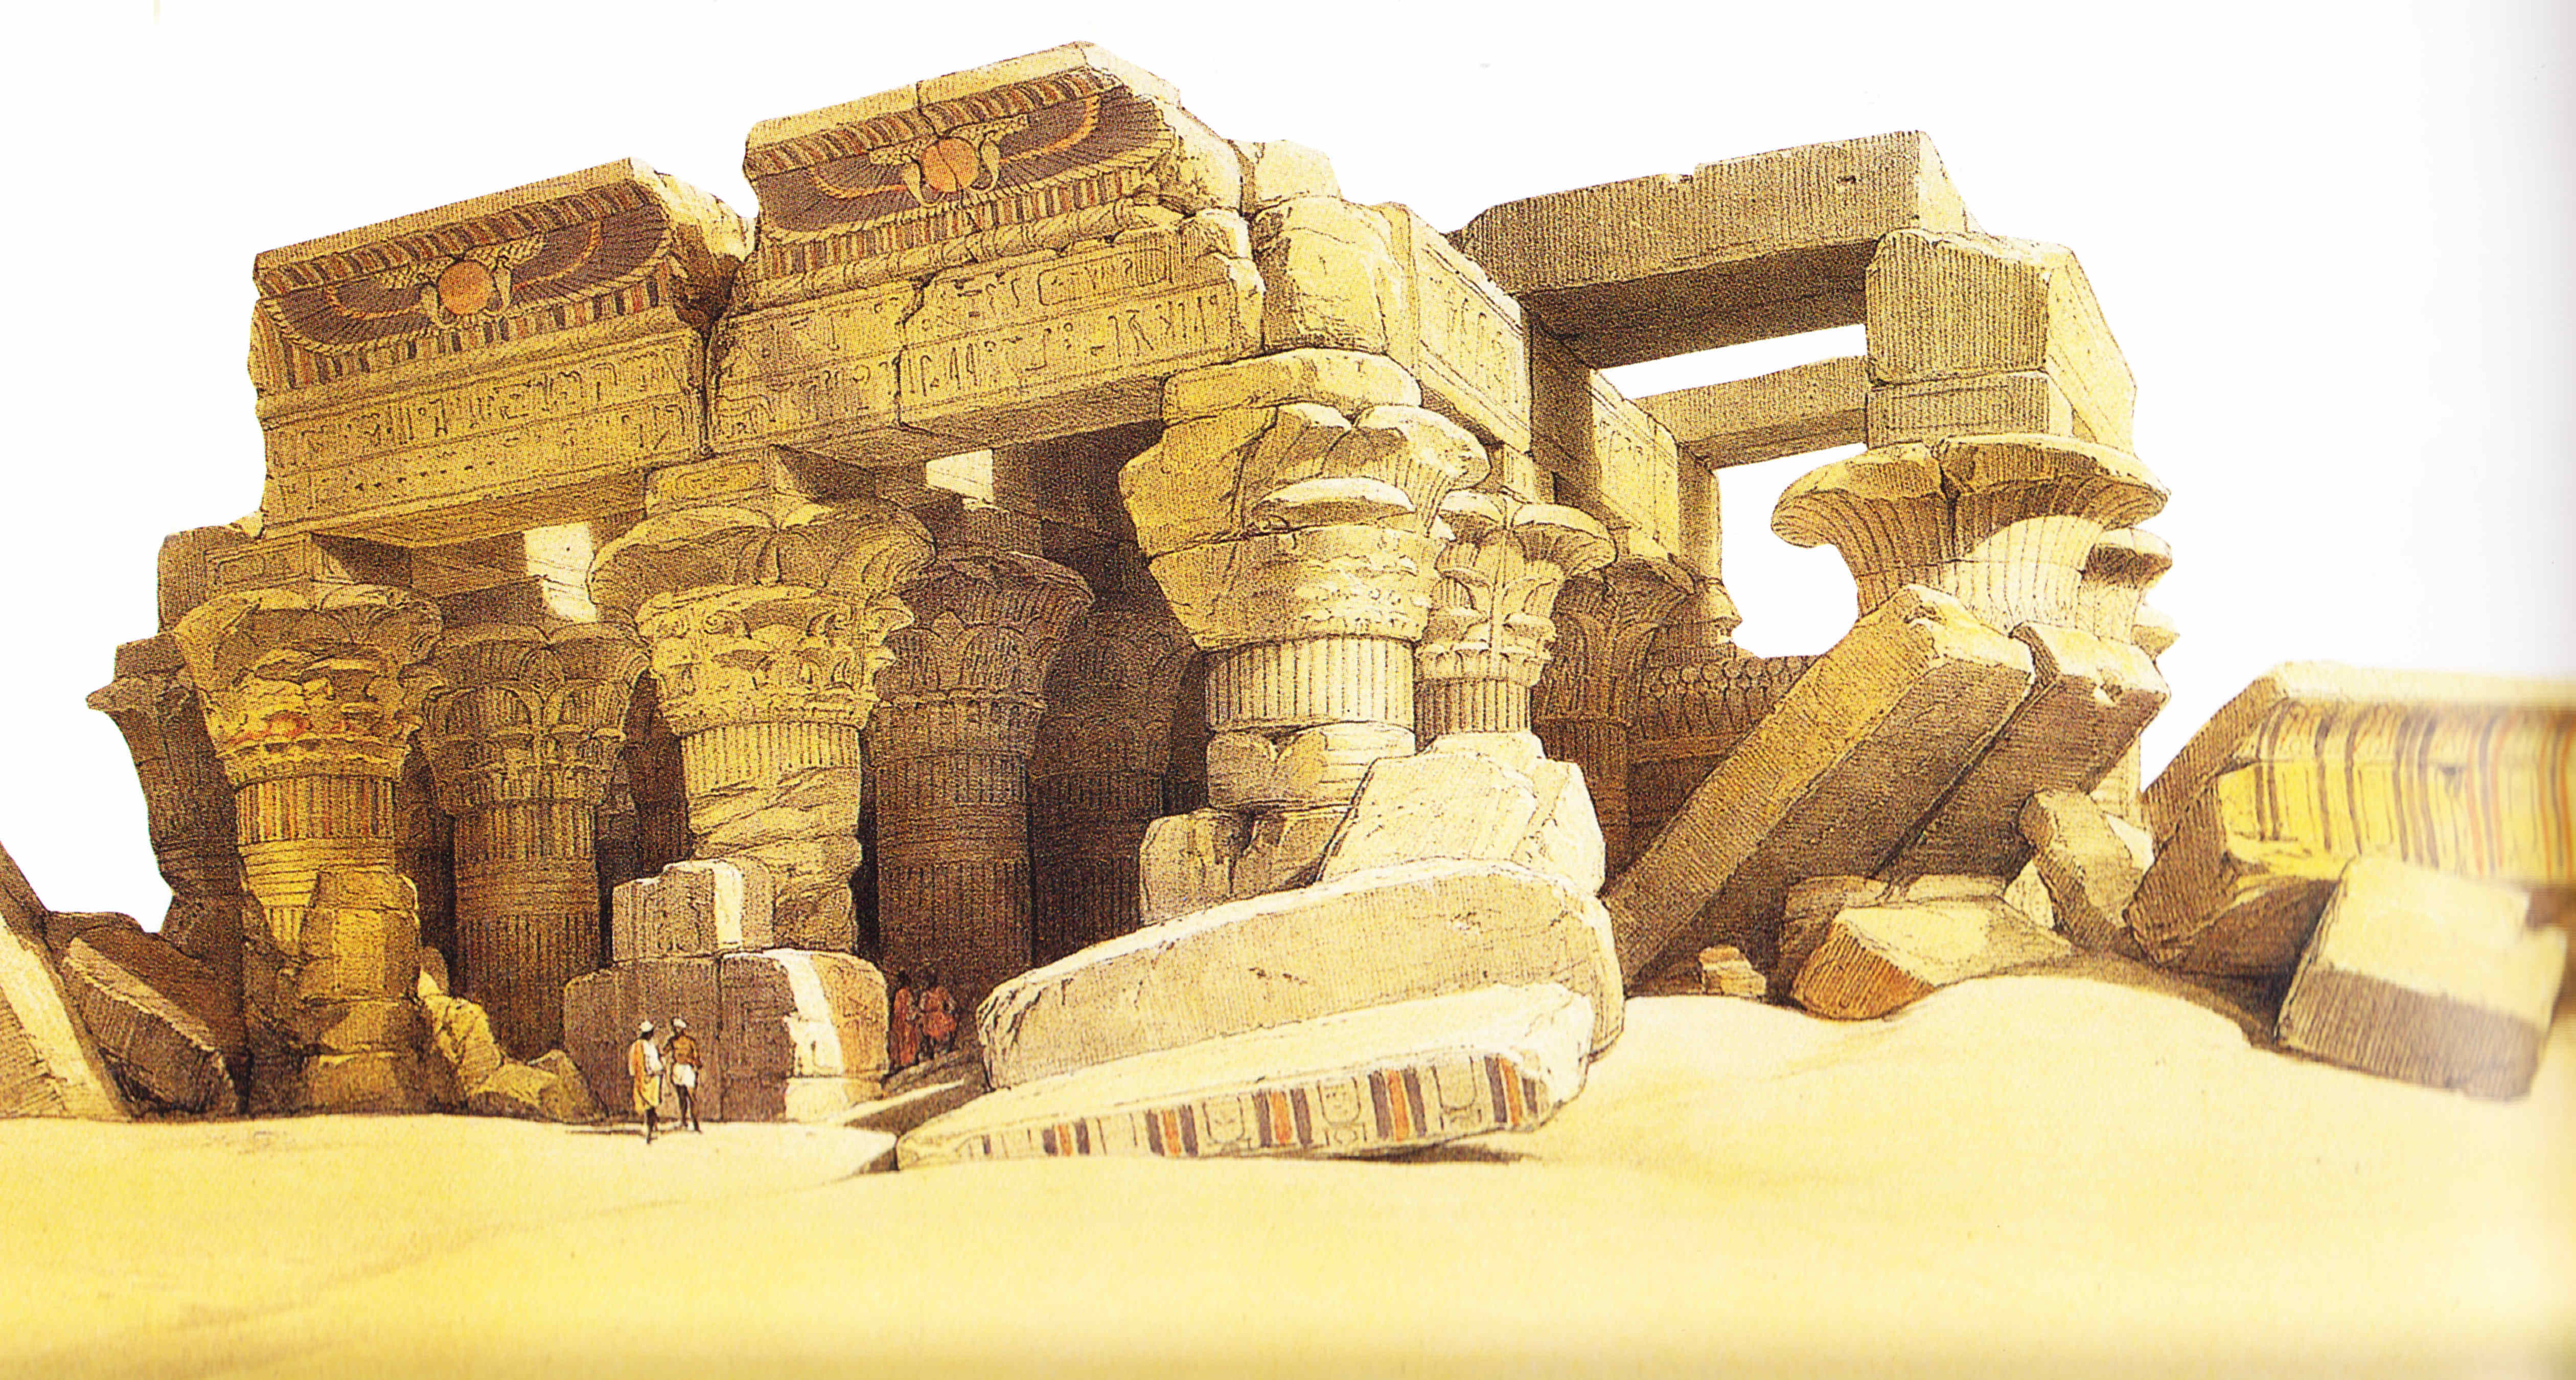 Egipto Antiguo 77 Plan B para Pelusio Egipto Antiguo 77 Plan B para Pelusio Egipto Antiguo 77 Plan B para Pelusio Egipto Antiguo 77 Plan B para Pelusio